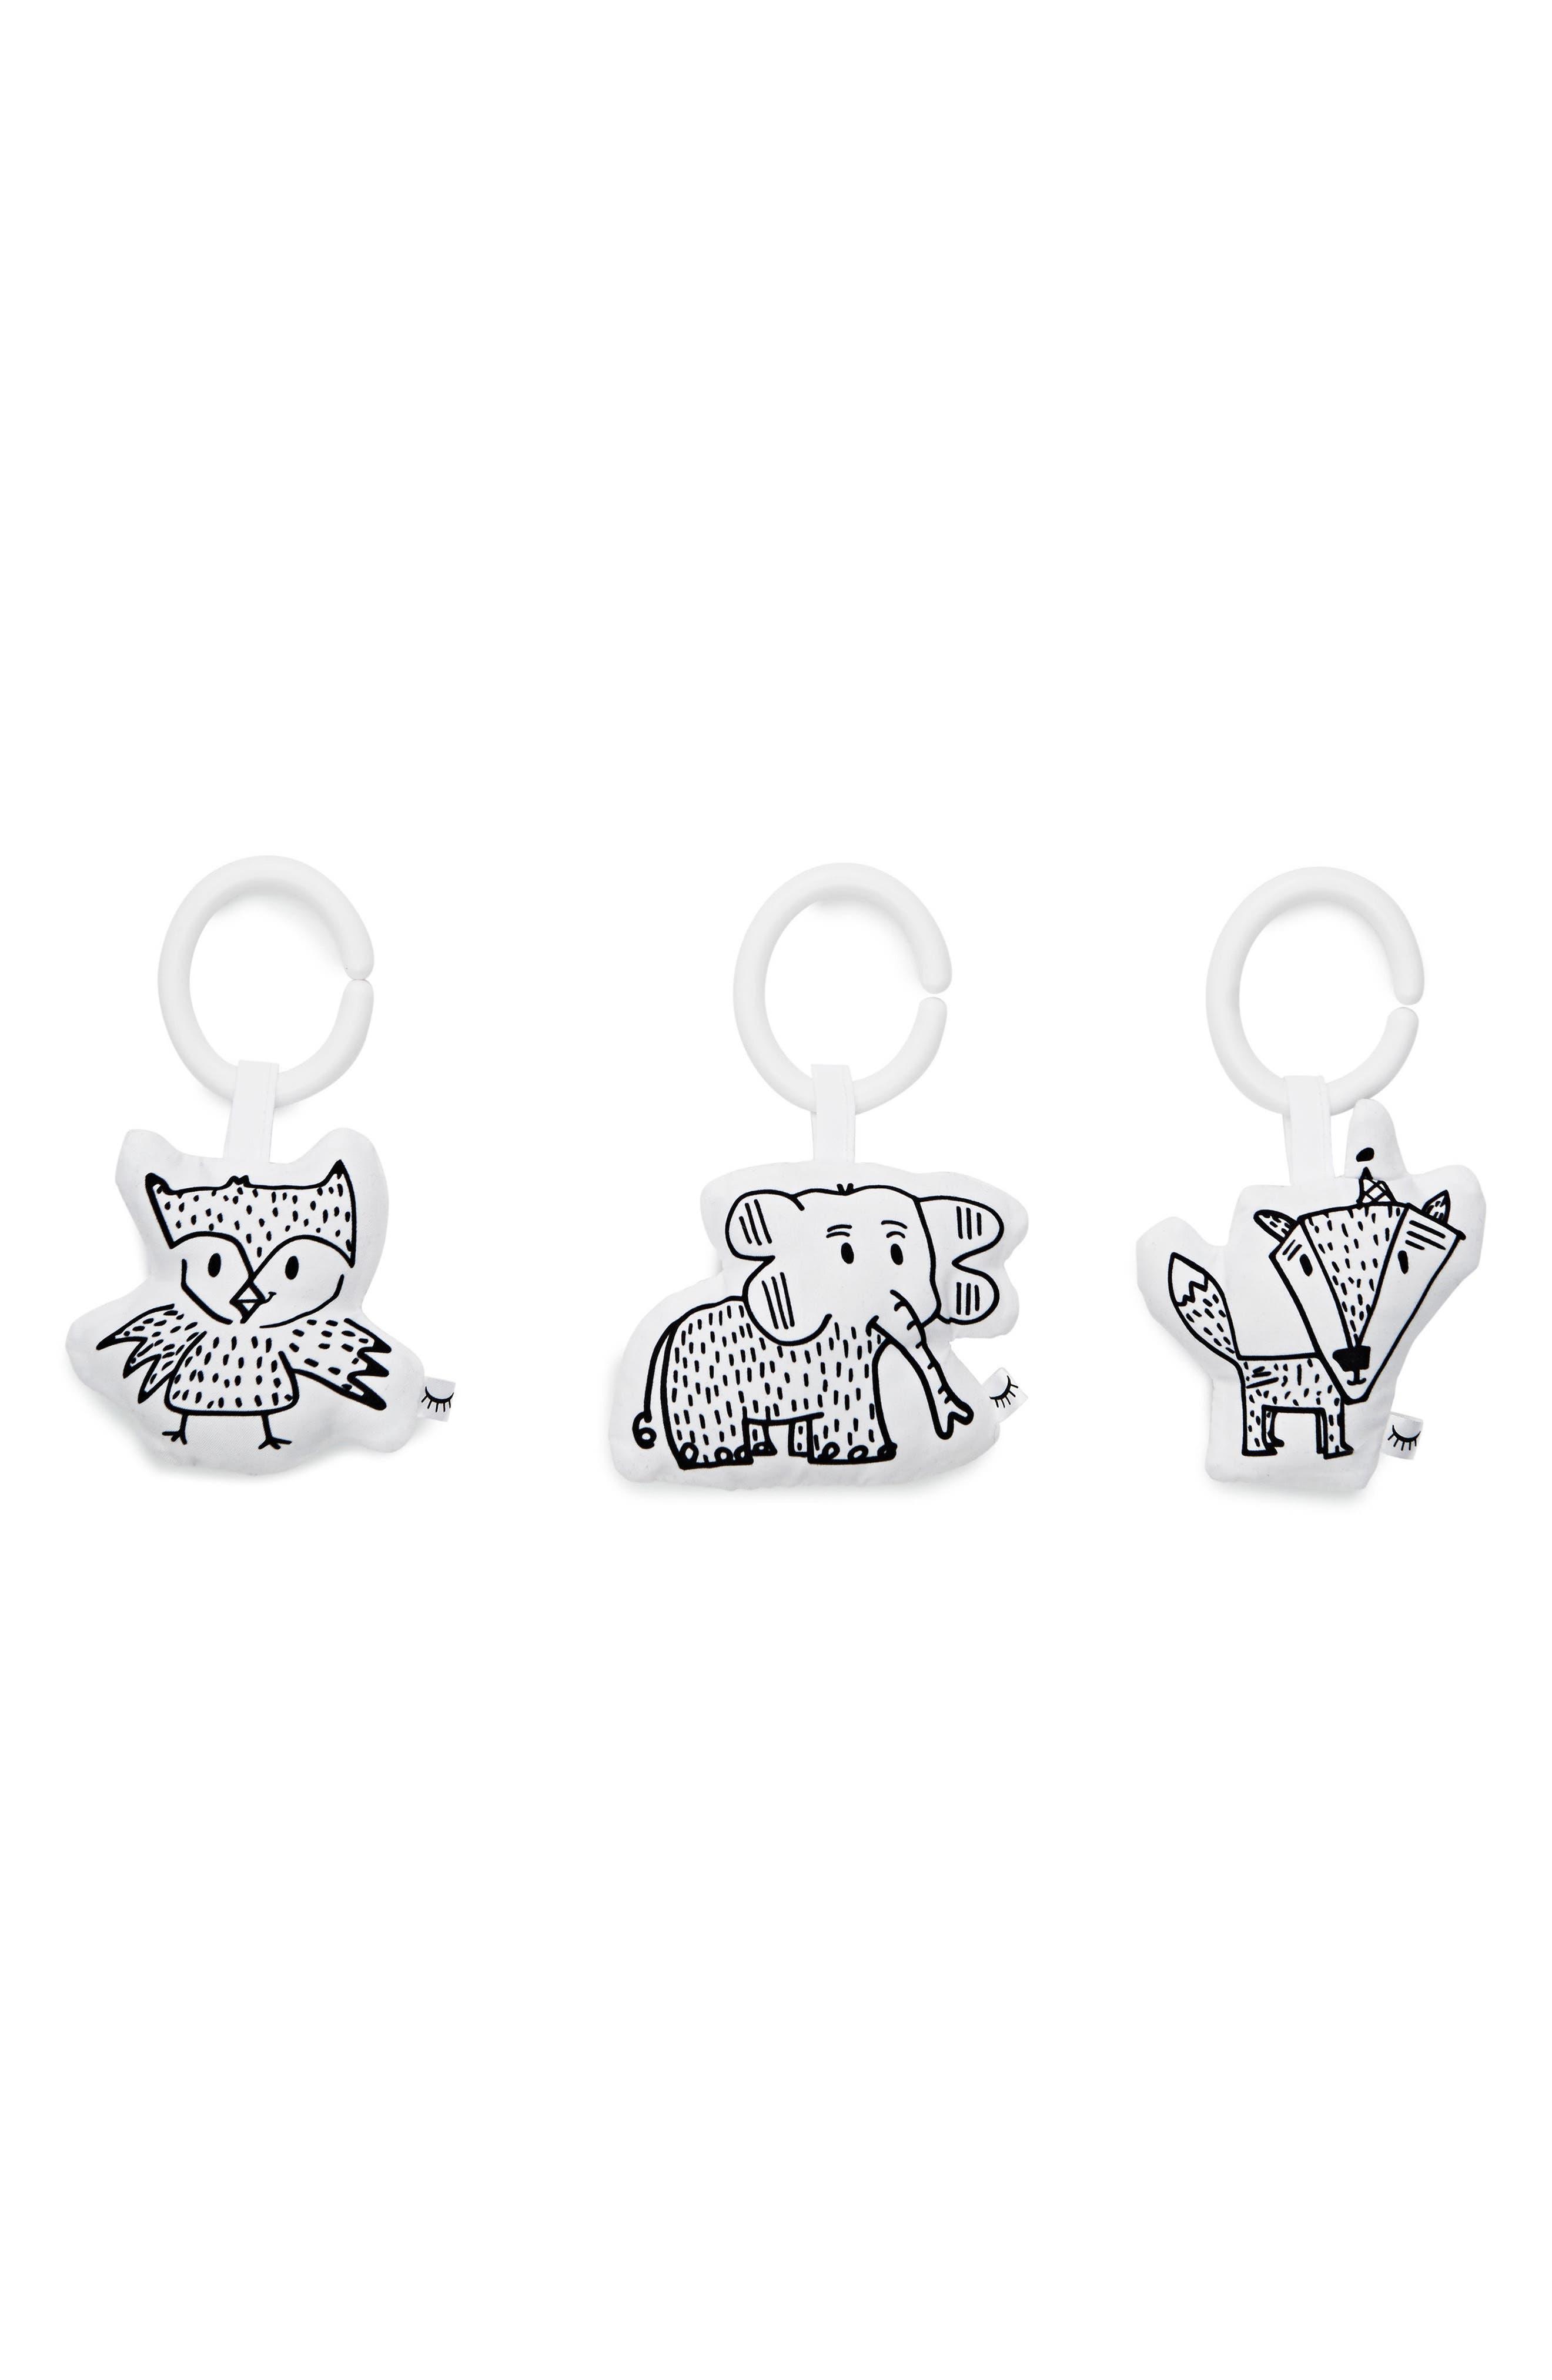 3-Piece Hanging Toy Set,                         Main,                         color, Black/ White